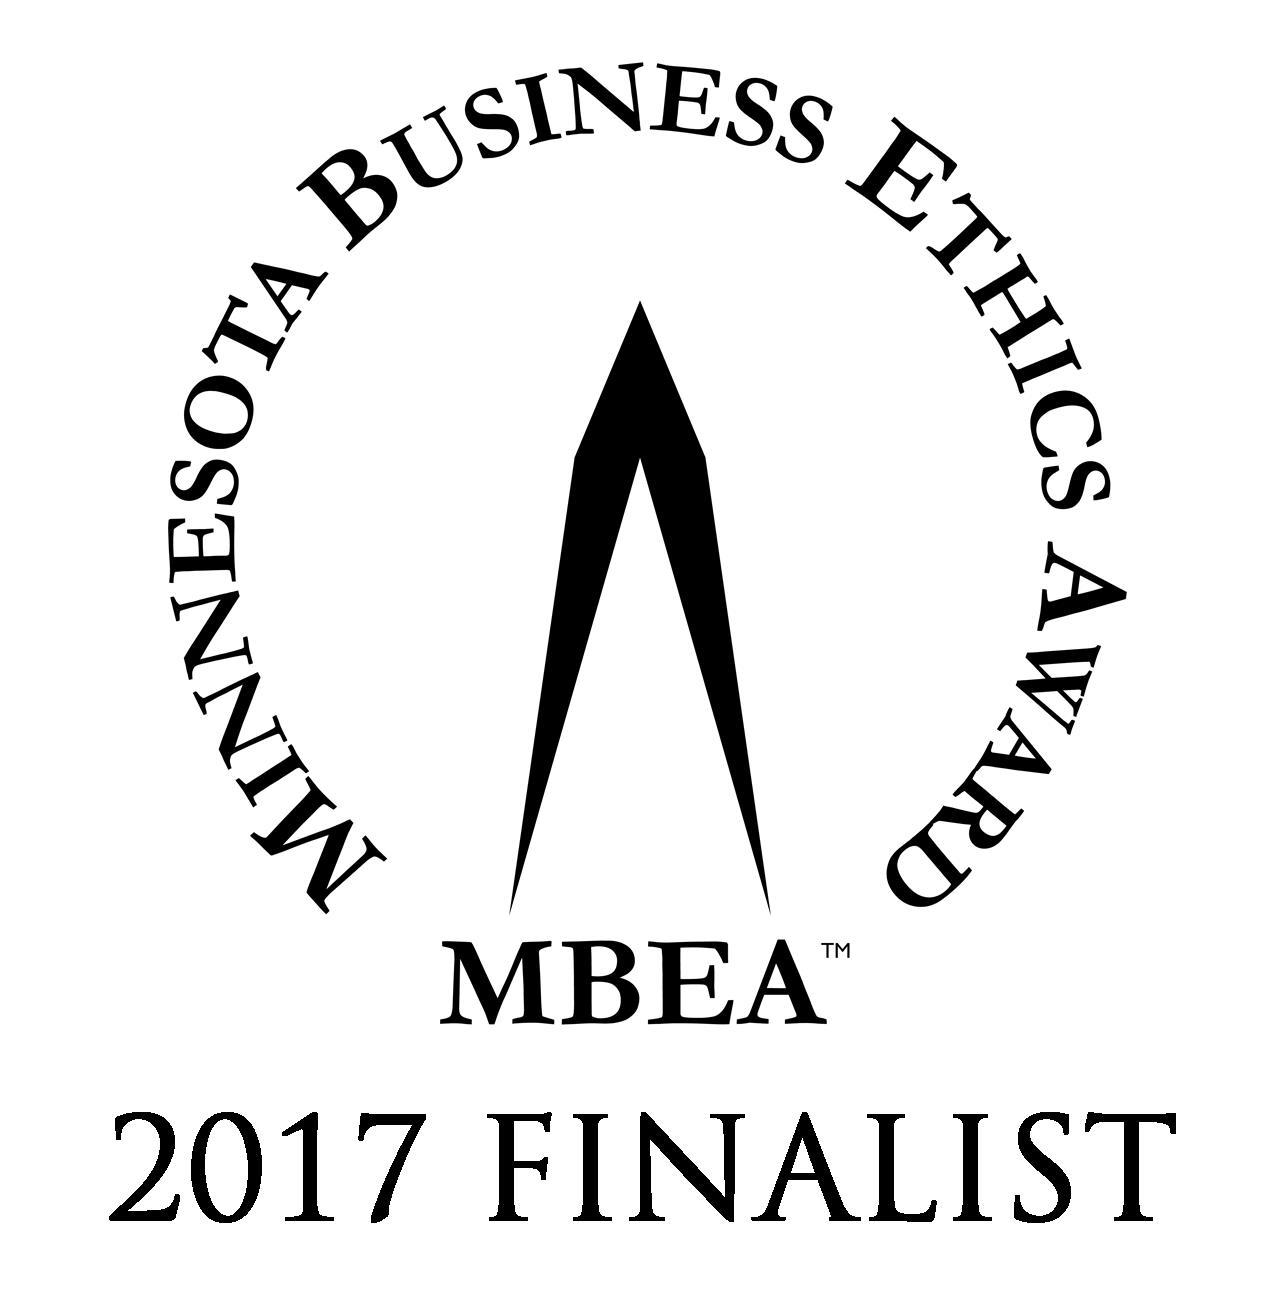 2017 MBEA Finalist